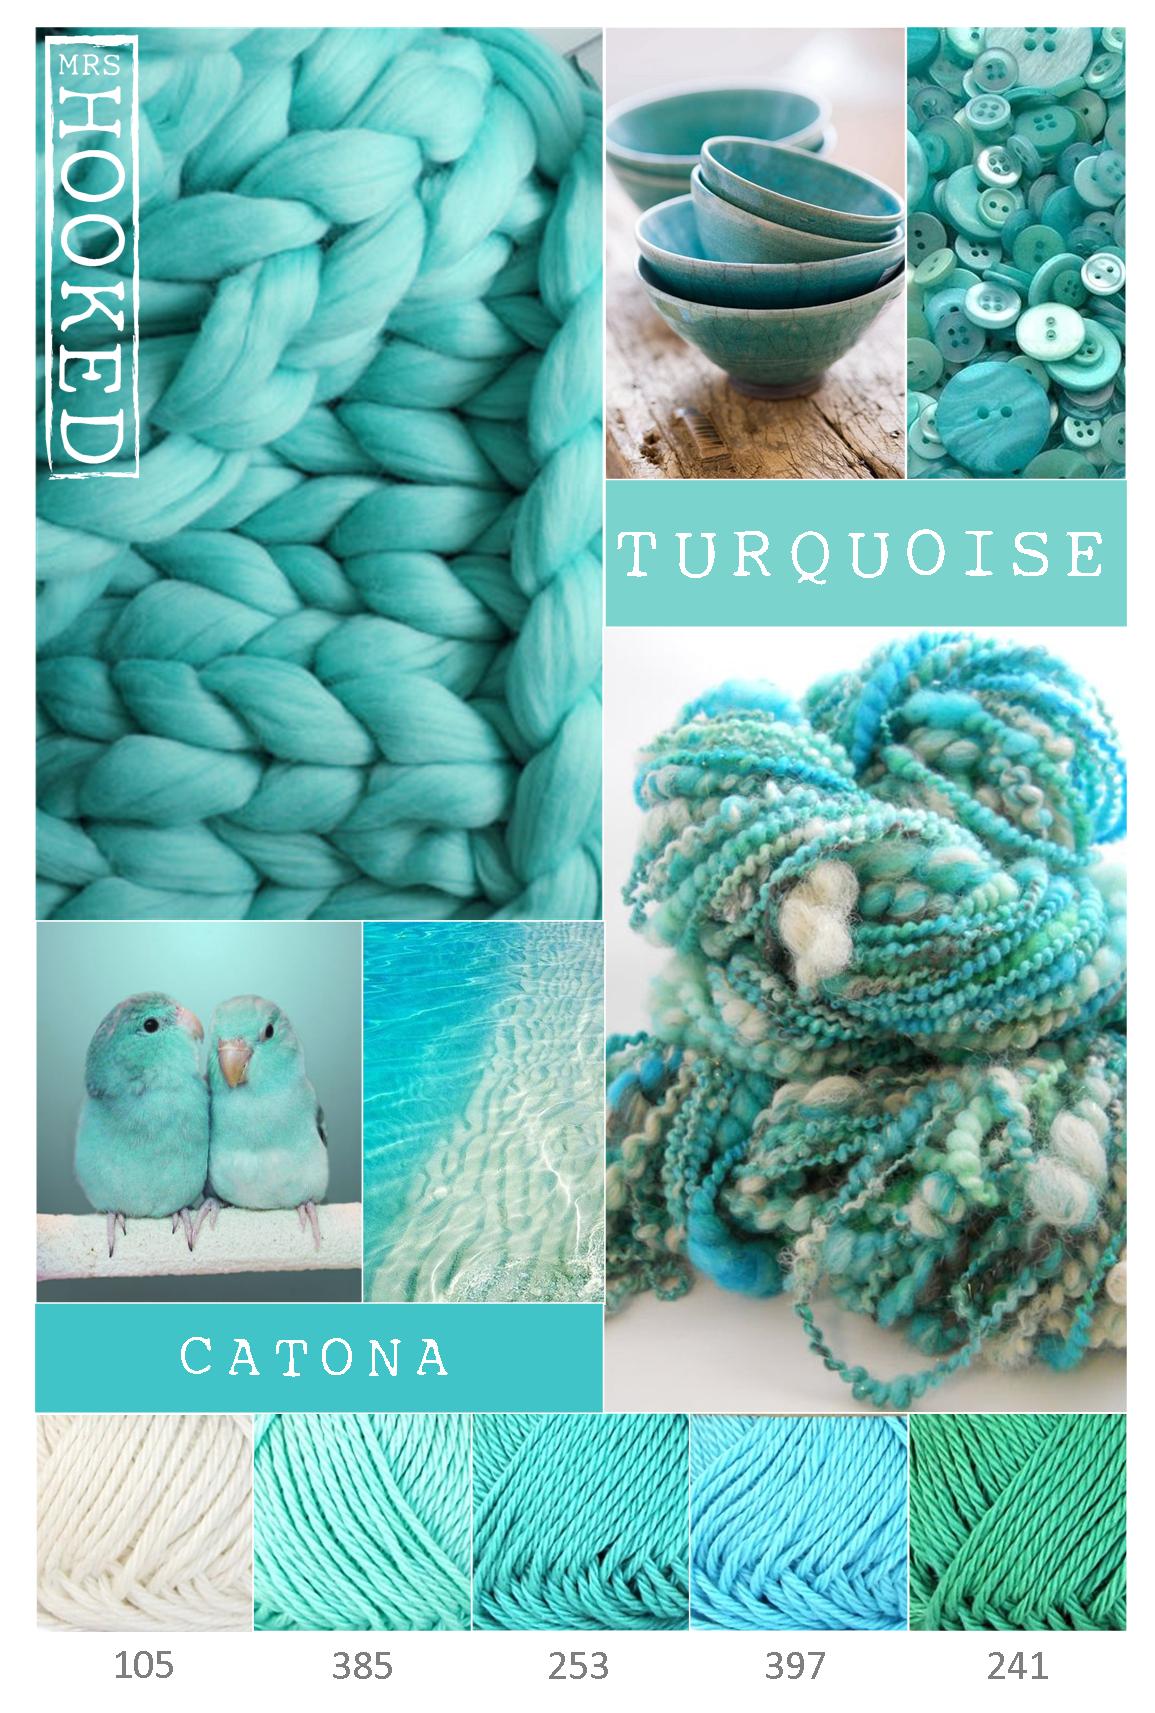 Turquoise - Kleurinspiratie turquoise - Scheepjes Catona - Mrshooked